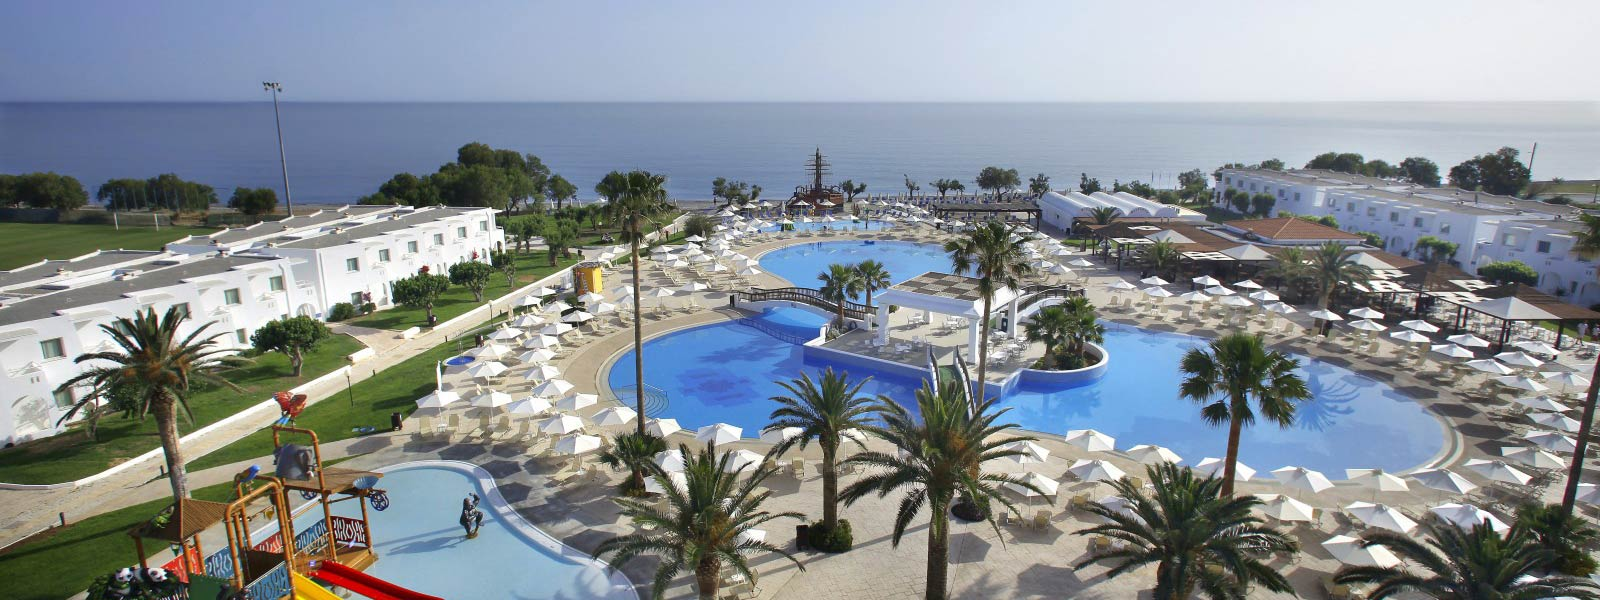 Creta Princess Aquapark & Spa Hotel-web